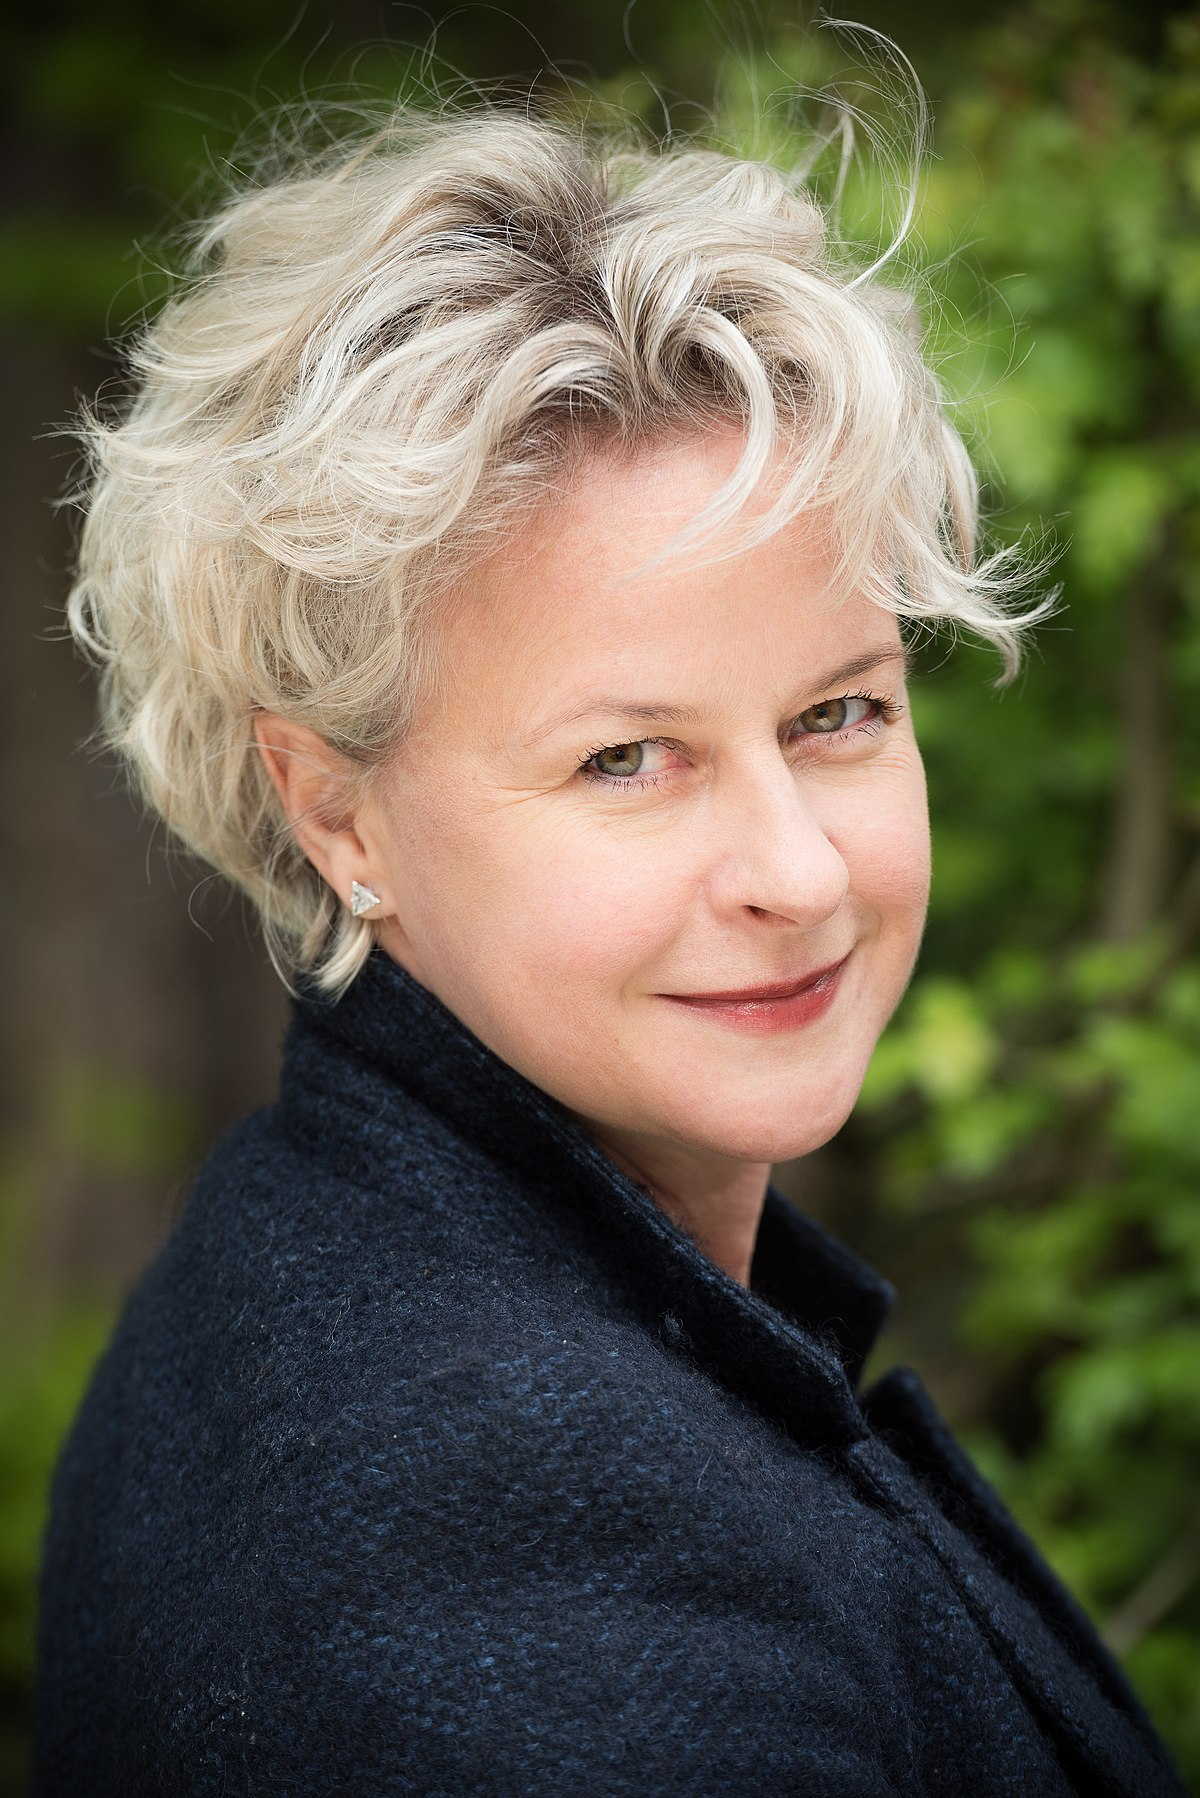 Angelica Ladurner – Wikipedia